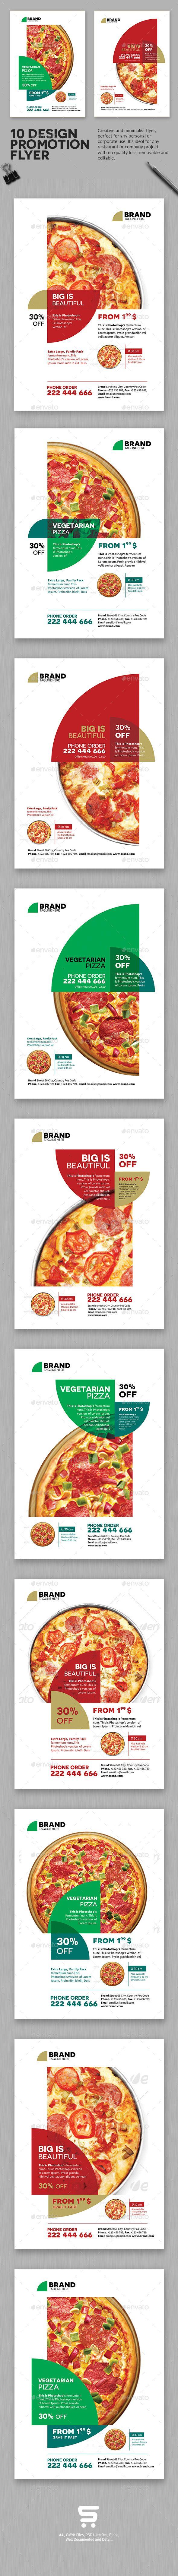 Universal Promotion Flyer Template #design Download: http://graphicriver.net/item/universal-promotion-flyer/12190911?ref=ksioks